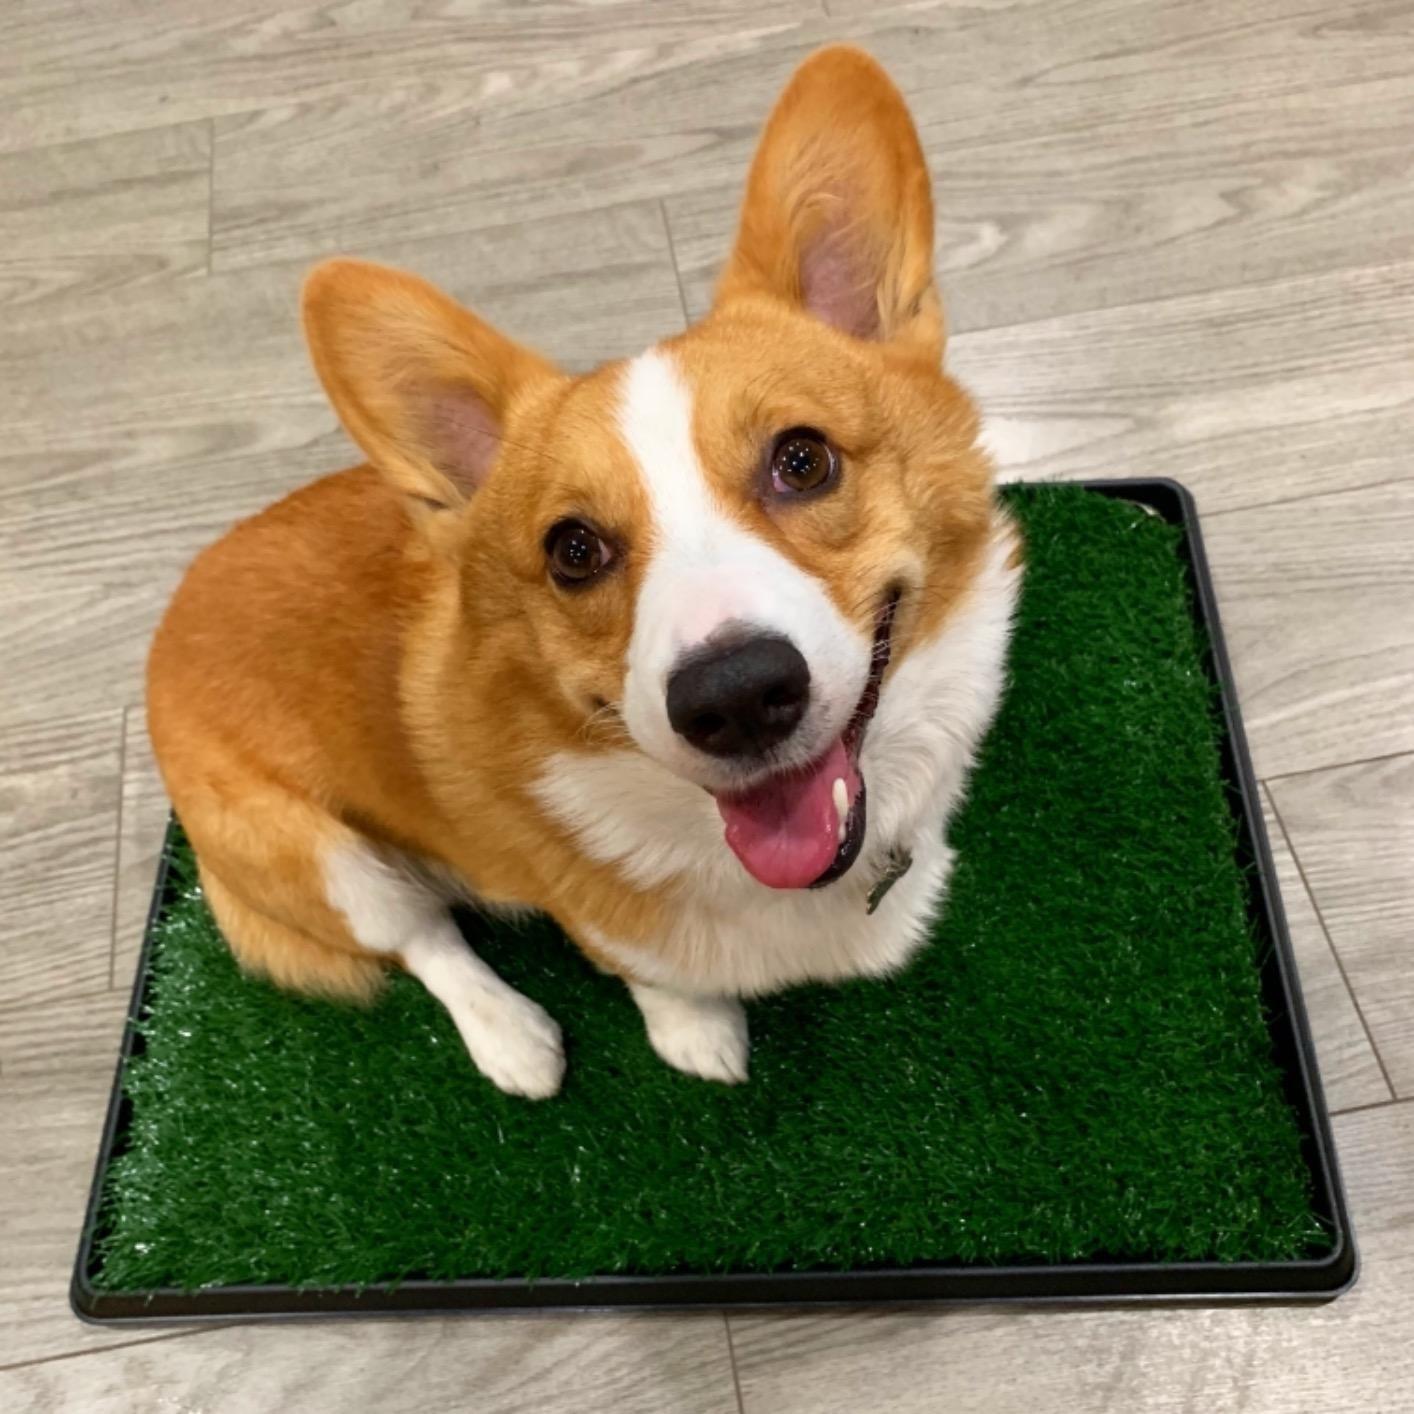 Reviewer photo of a corgi sitting on the grass mat